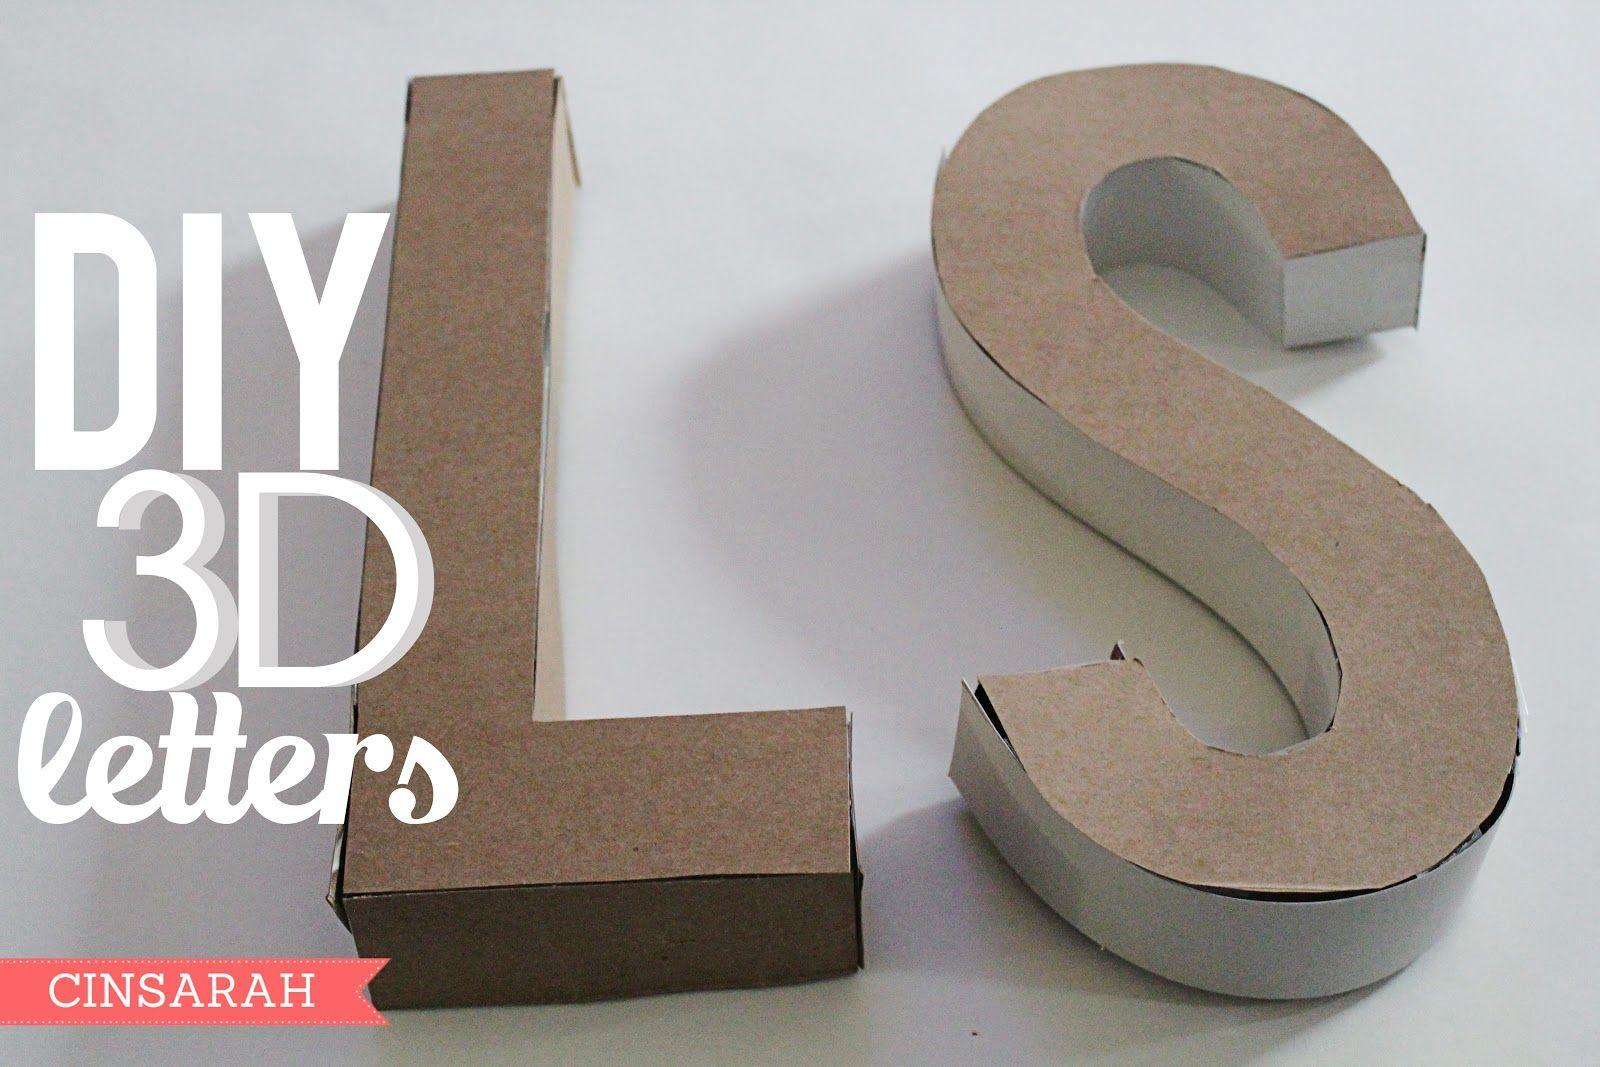 3d Letter Diy.Cinsarah Diy 3d Letters Using Cereal Boxes Cinsarah Blog